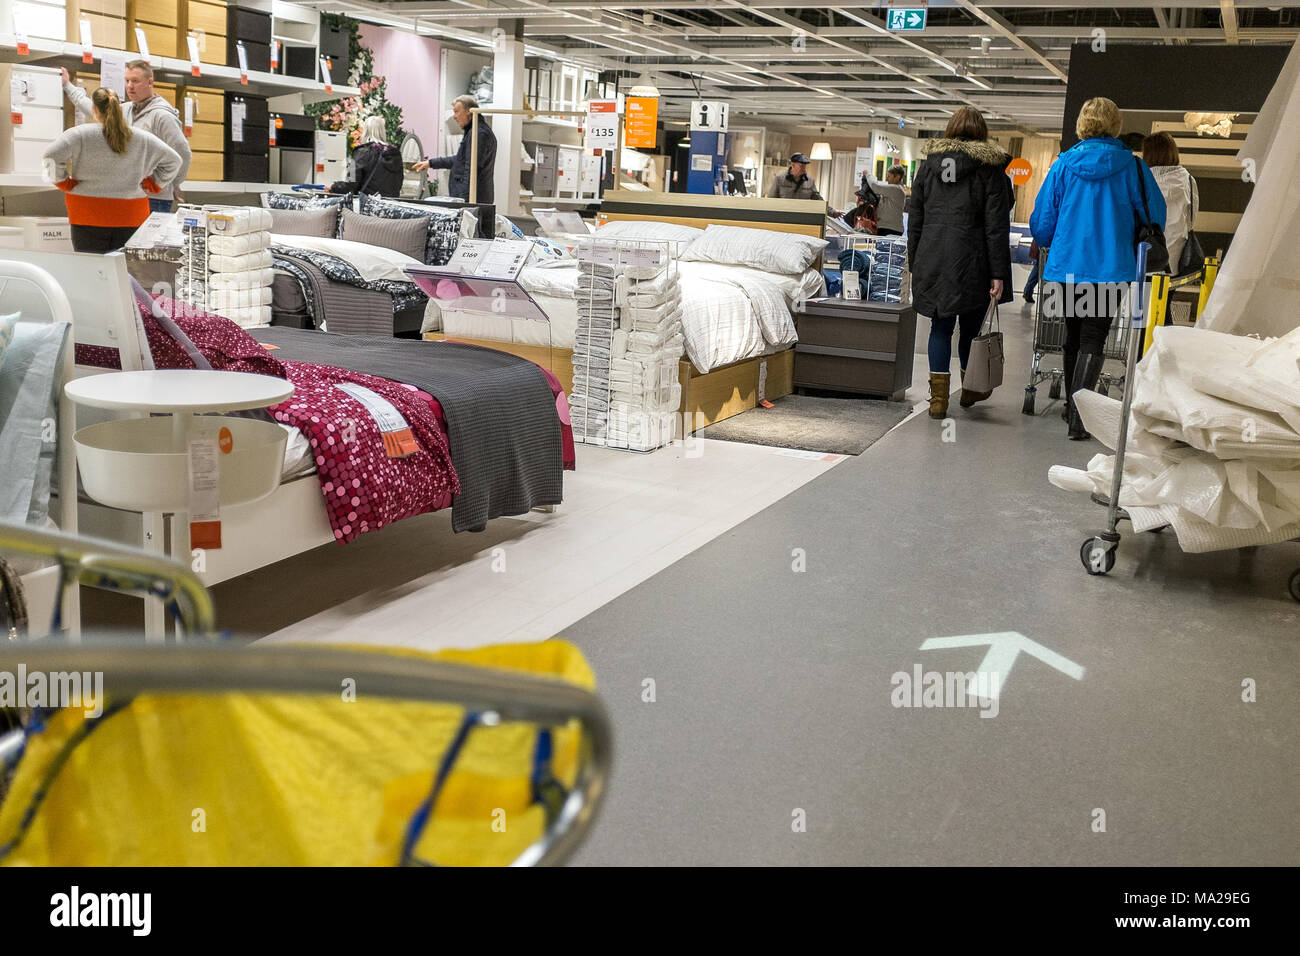 ikea customers stock photos ikea customers stock images alamy. Black Bedroom Furniture Sets. Home Design Ideas